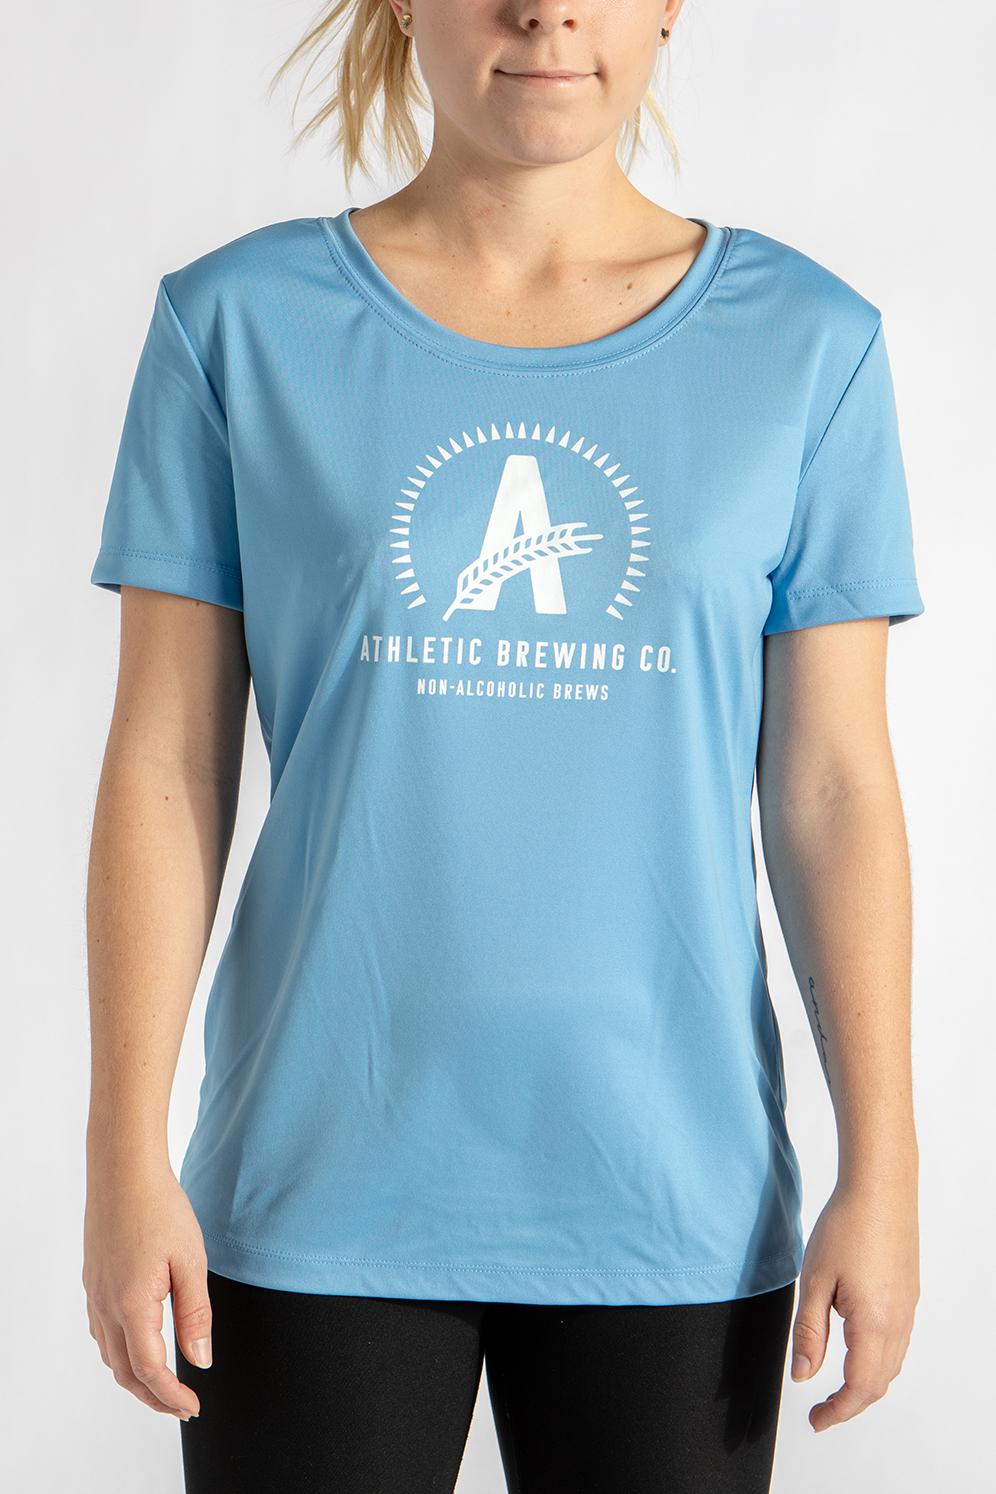 7207640c6 Women's Dri-Fit T-Shirt | Athletic Brewing Company | Craft Non ...